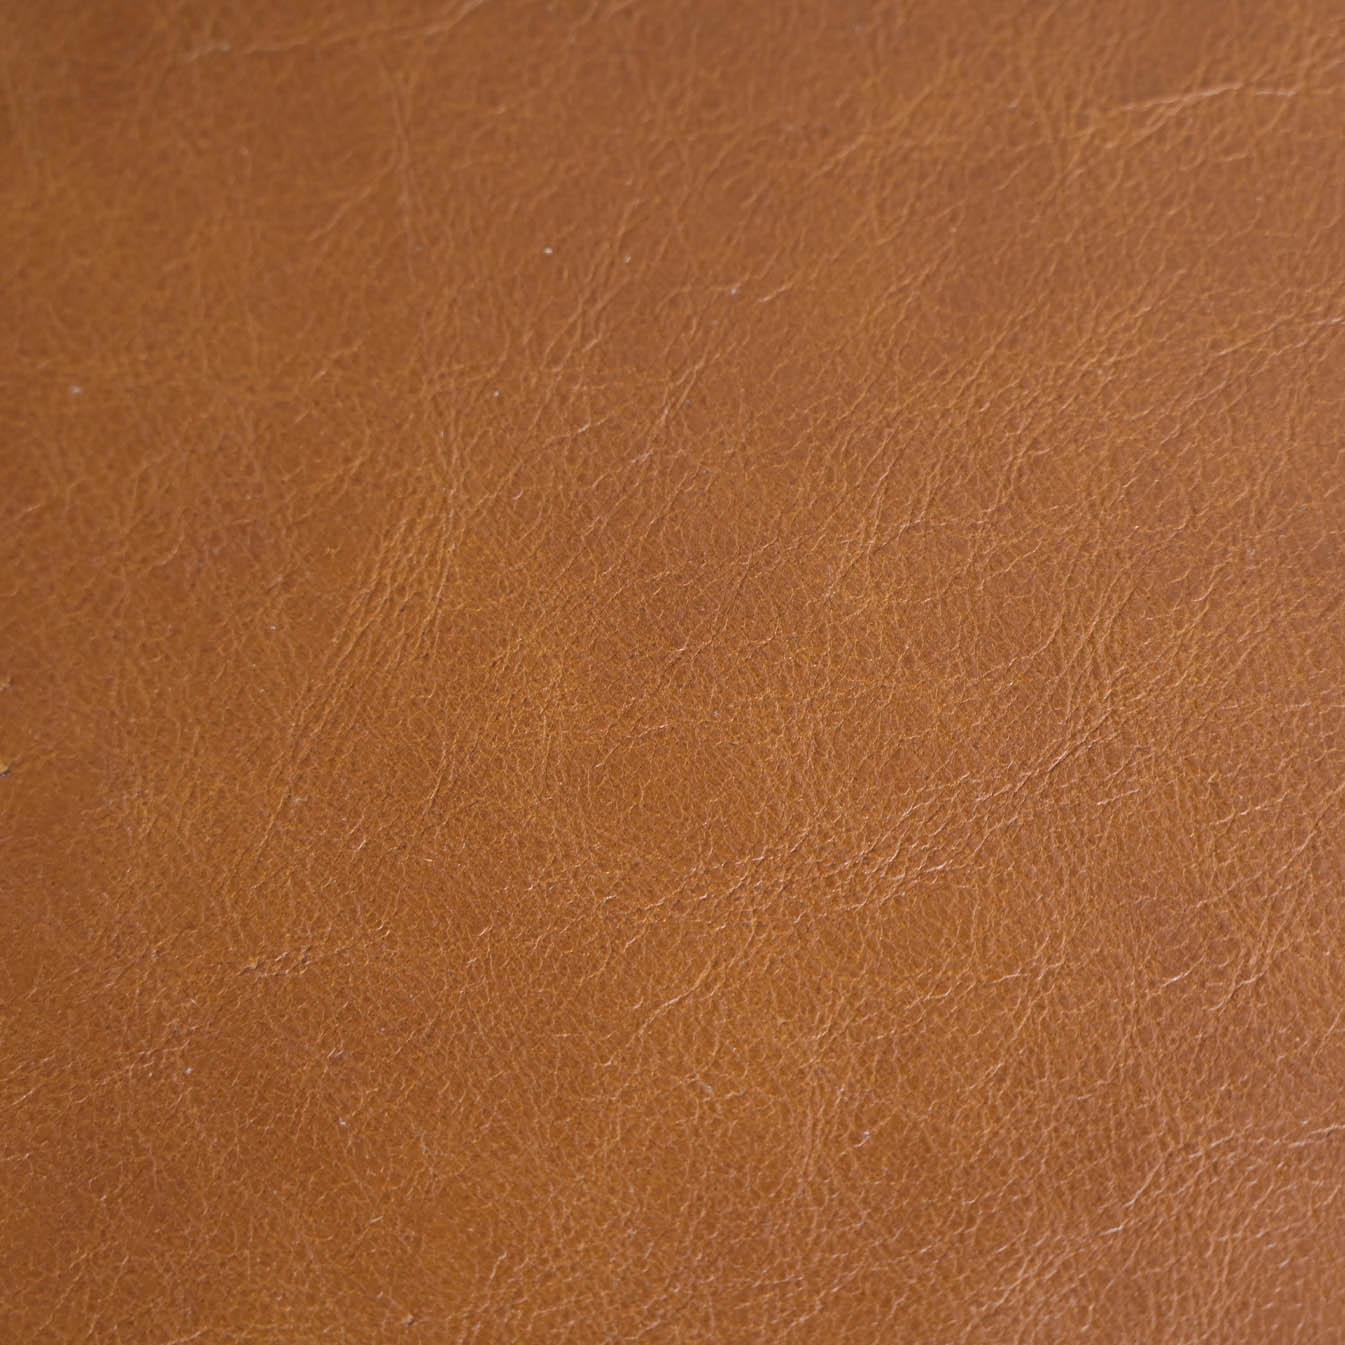 laguna leather in tan color